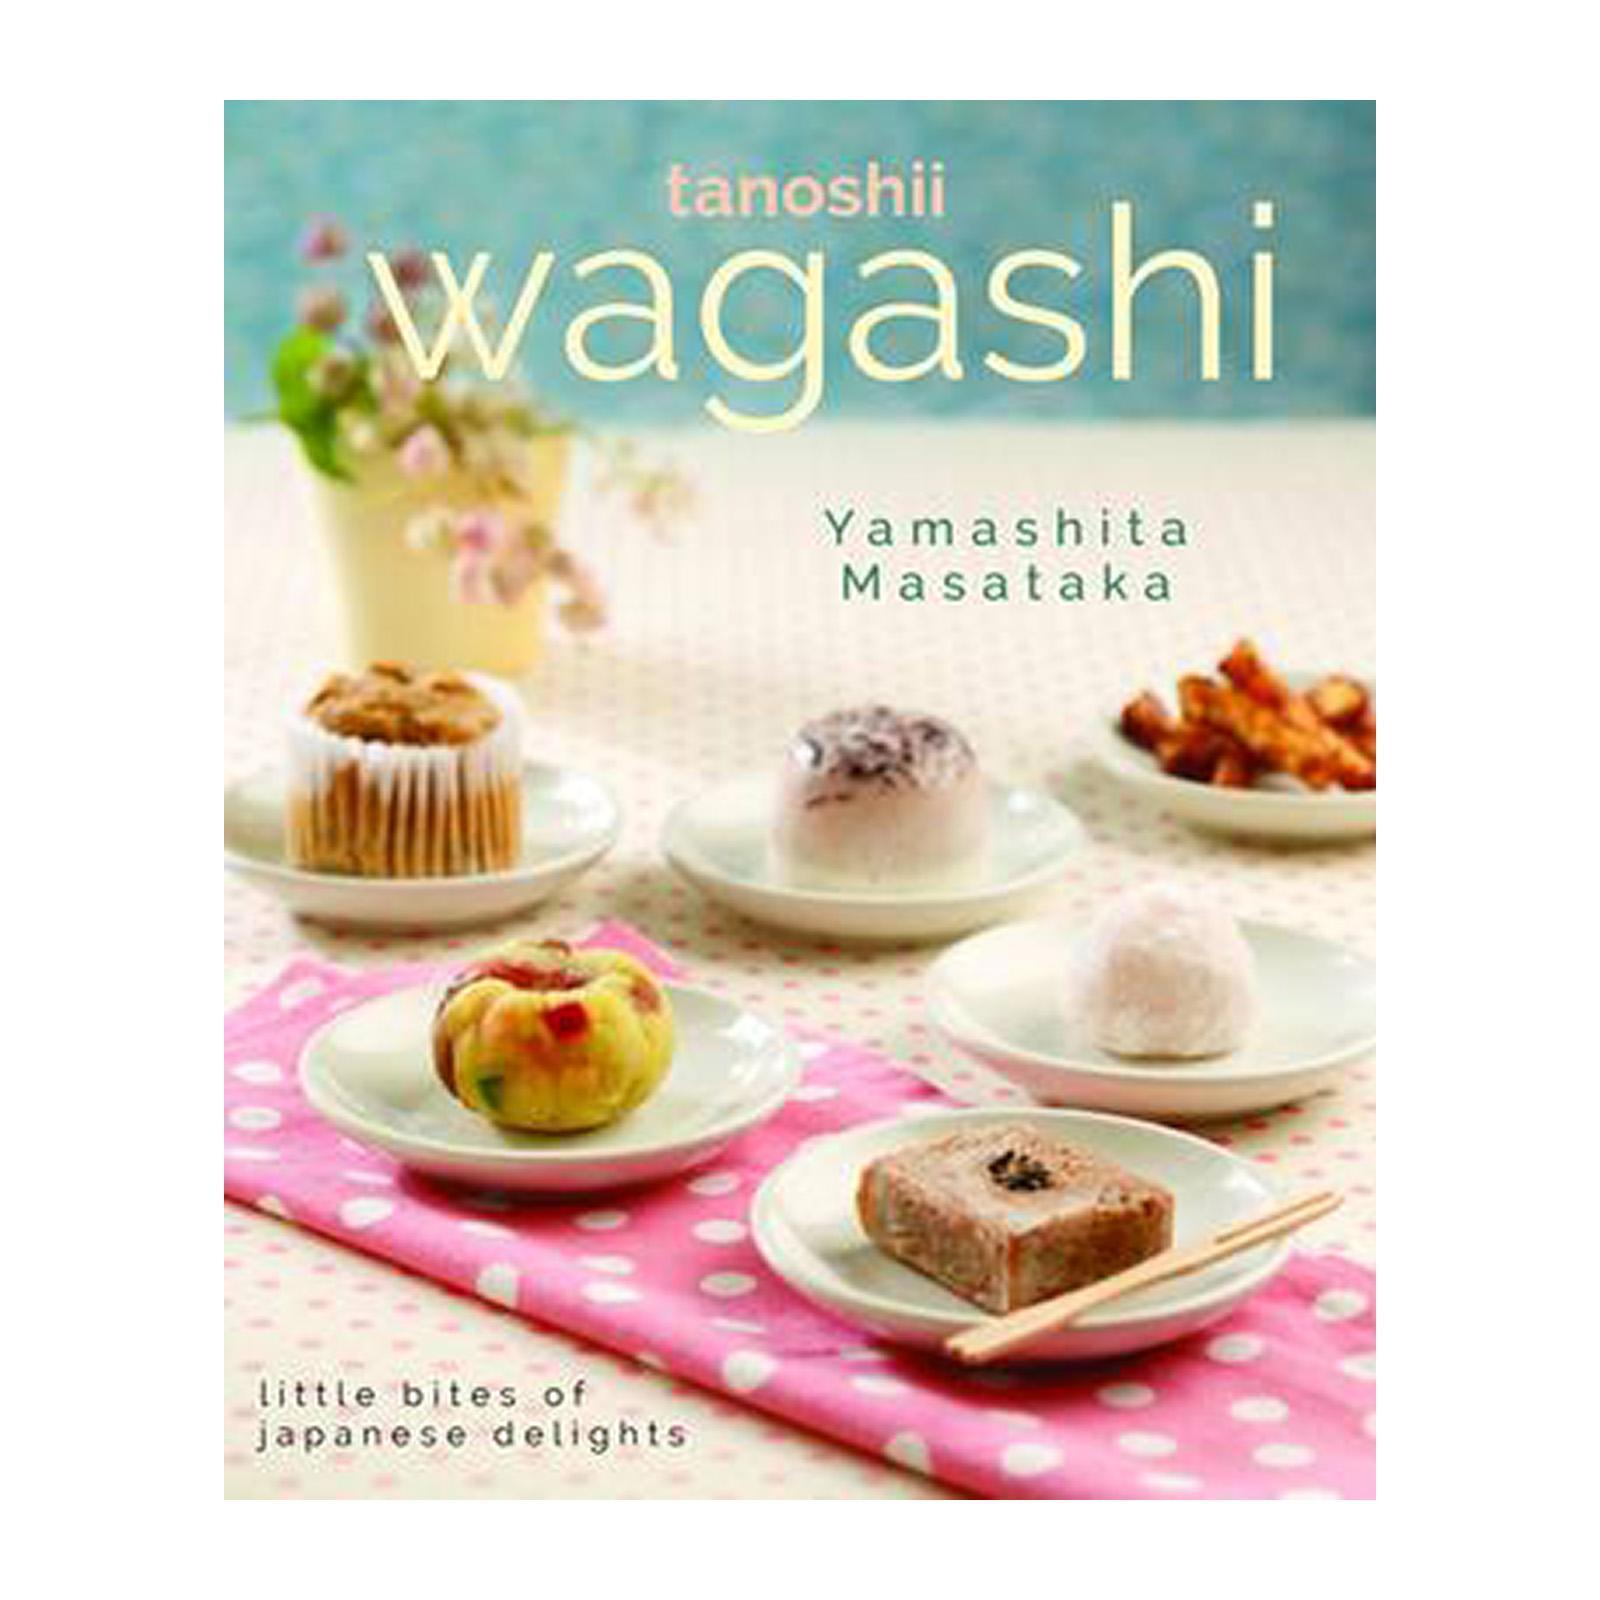 Wagashi: Little Bites Of Japanese Delights (Paperback)